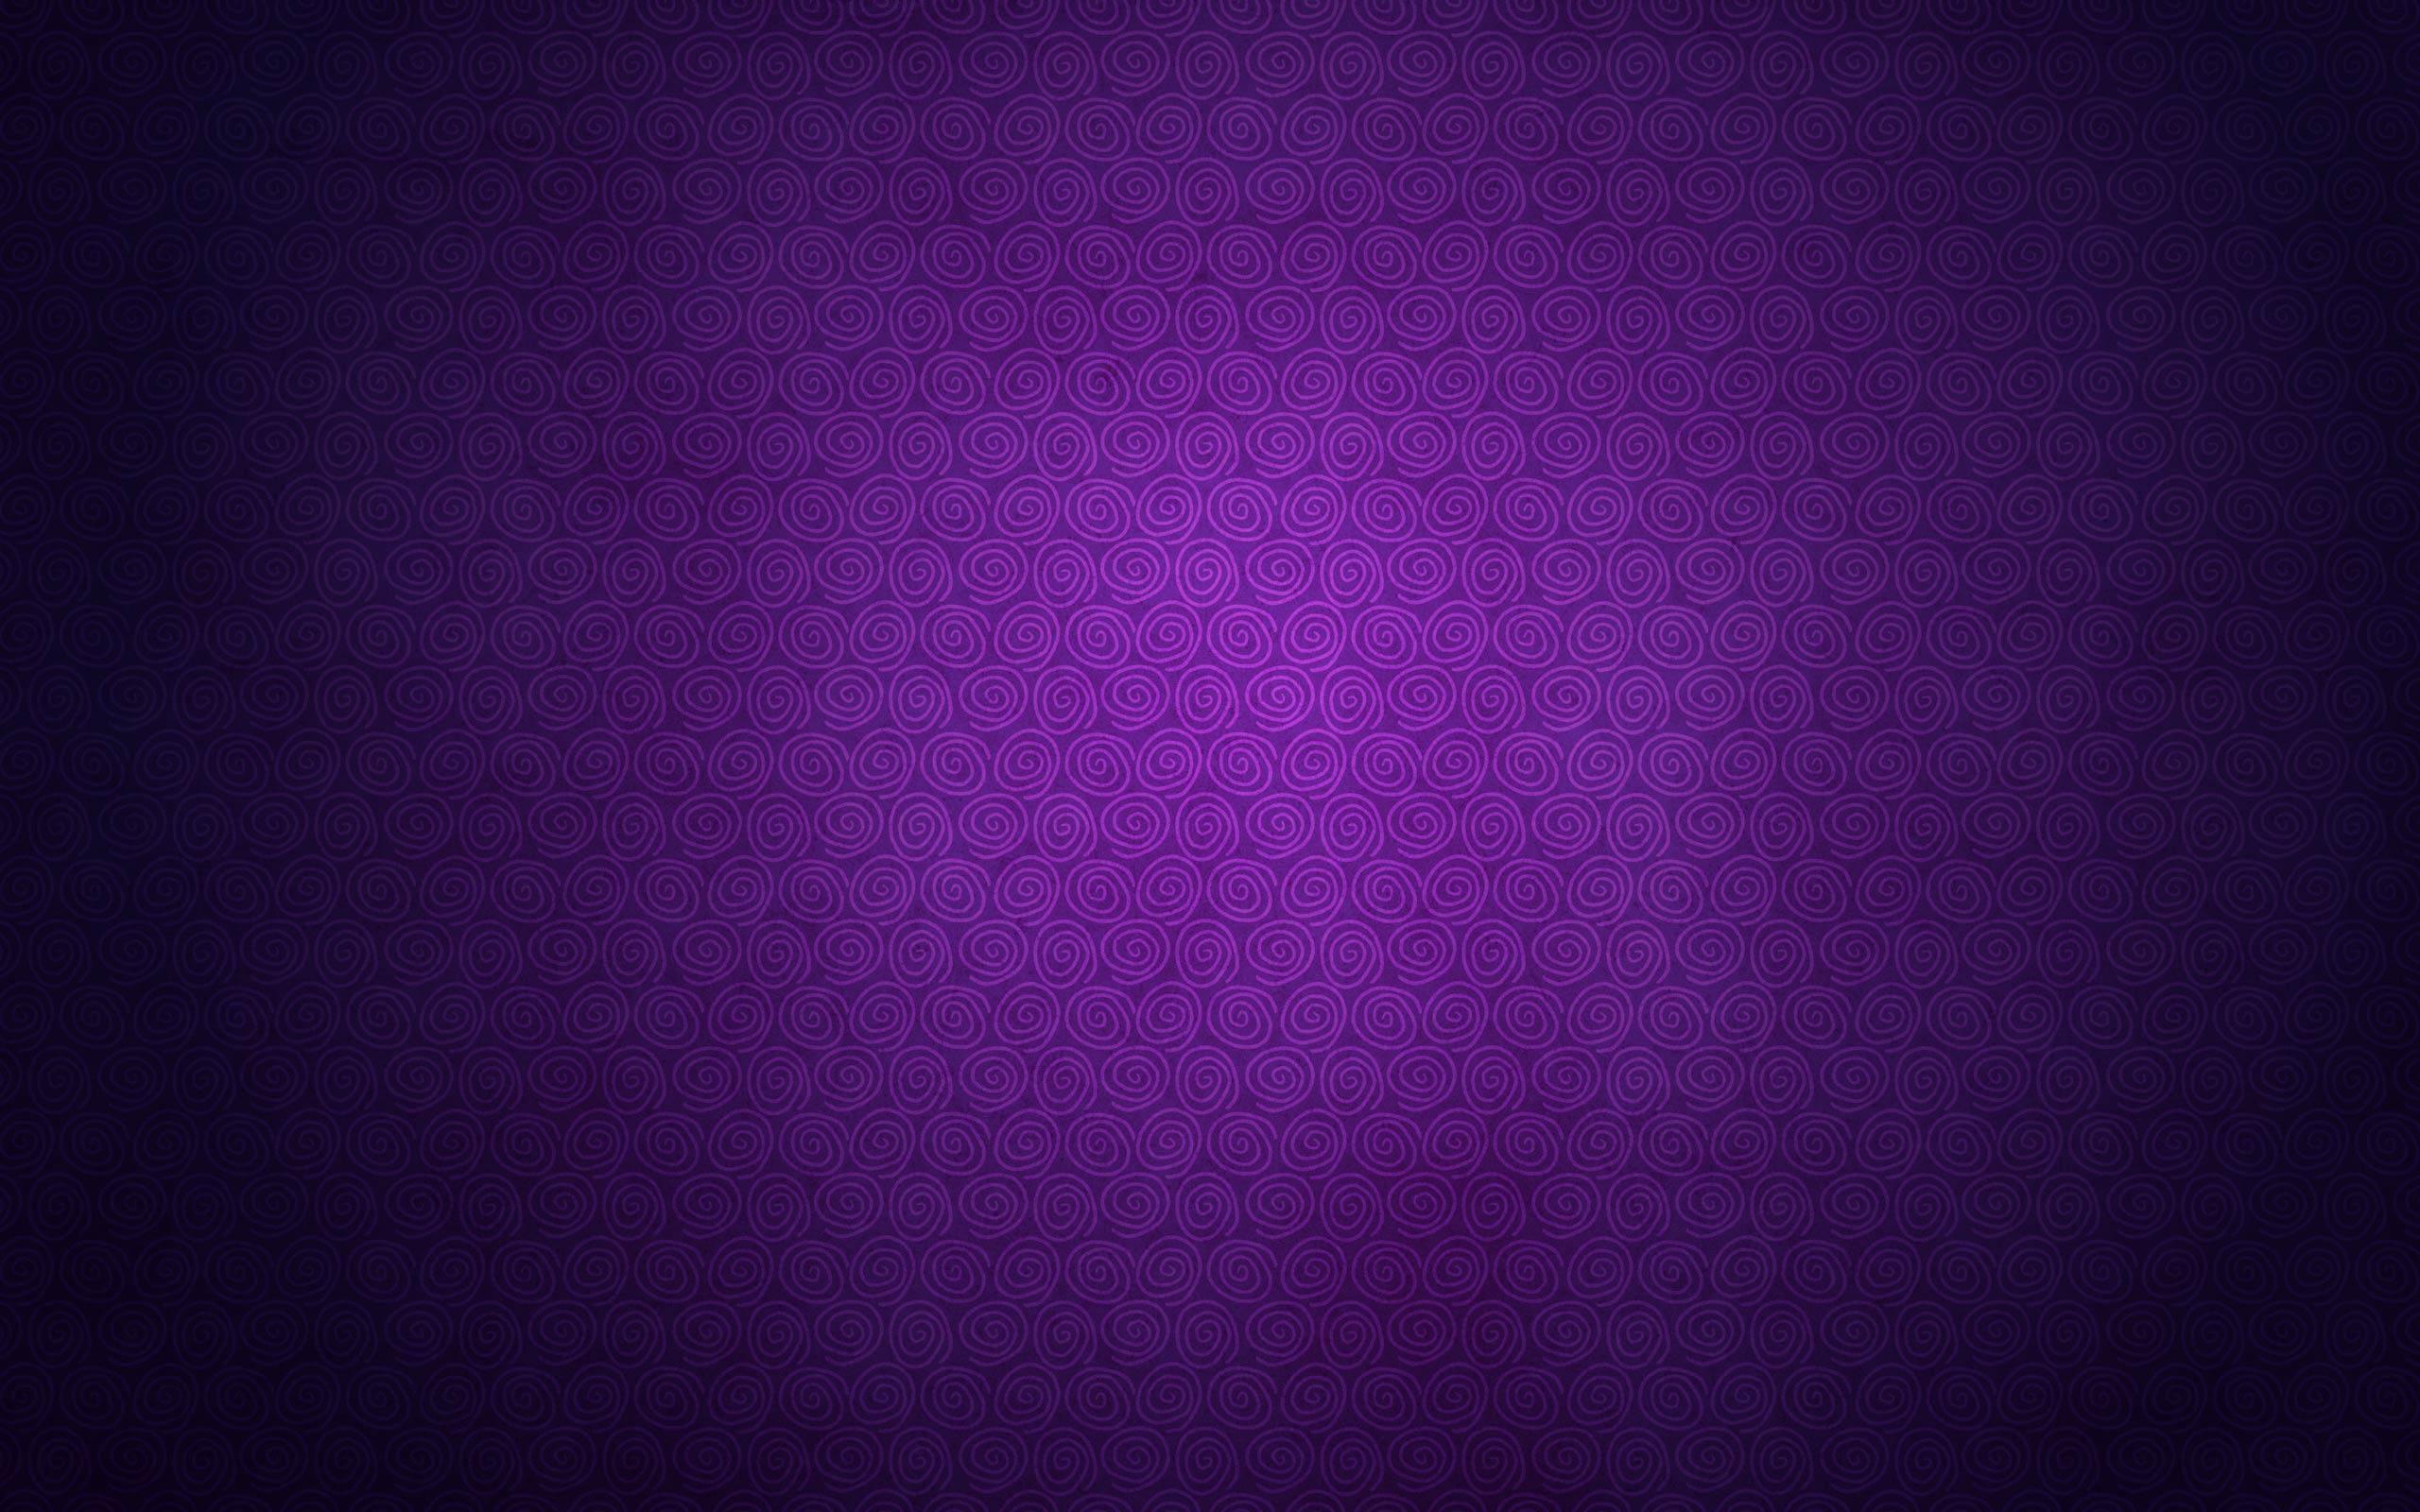 Purple Wallpapers 12 Best Wallpapers Collection Desktop: Purple Wallpaper Backgrounds (53+ Images